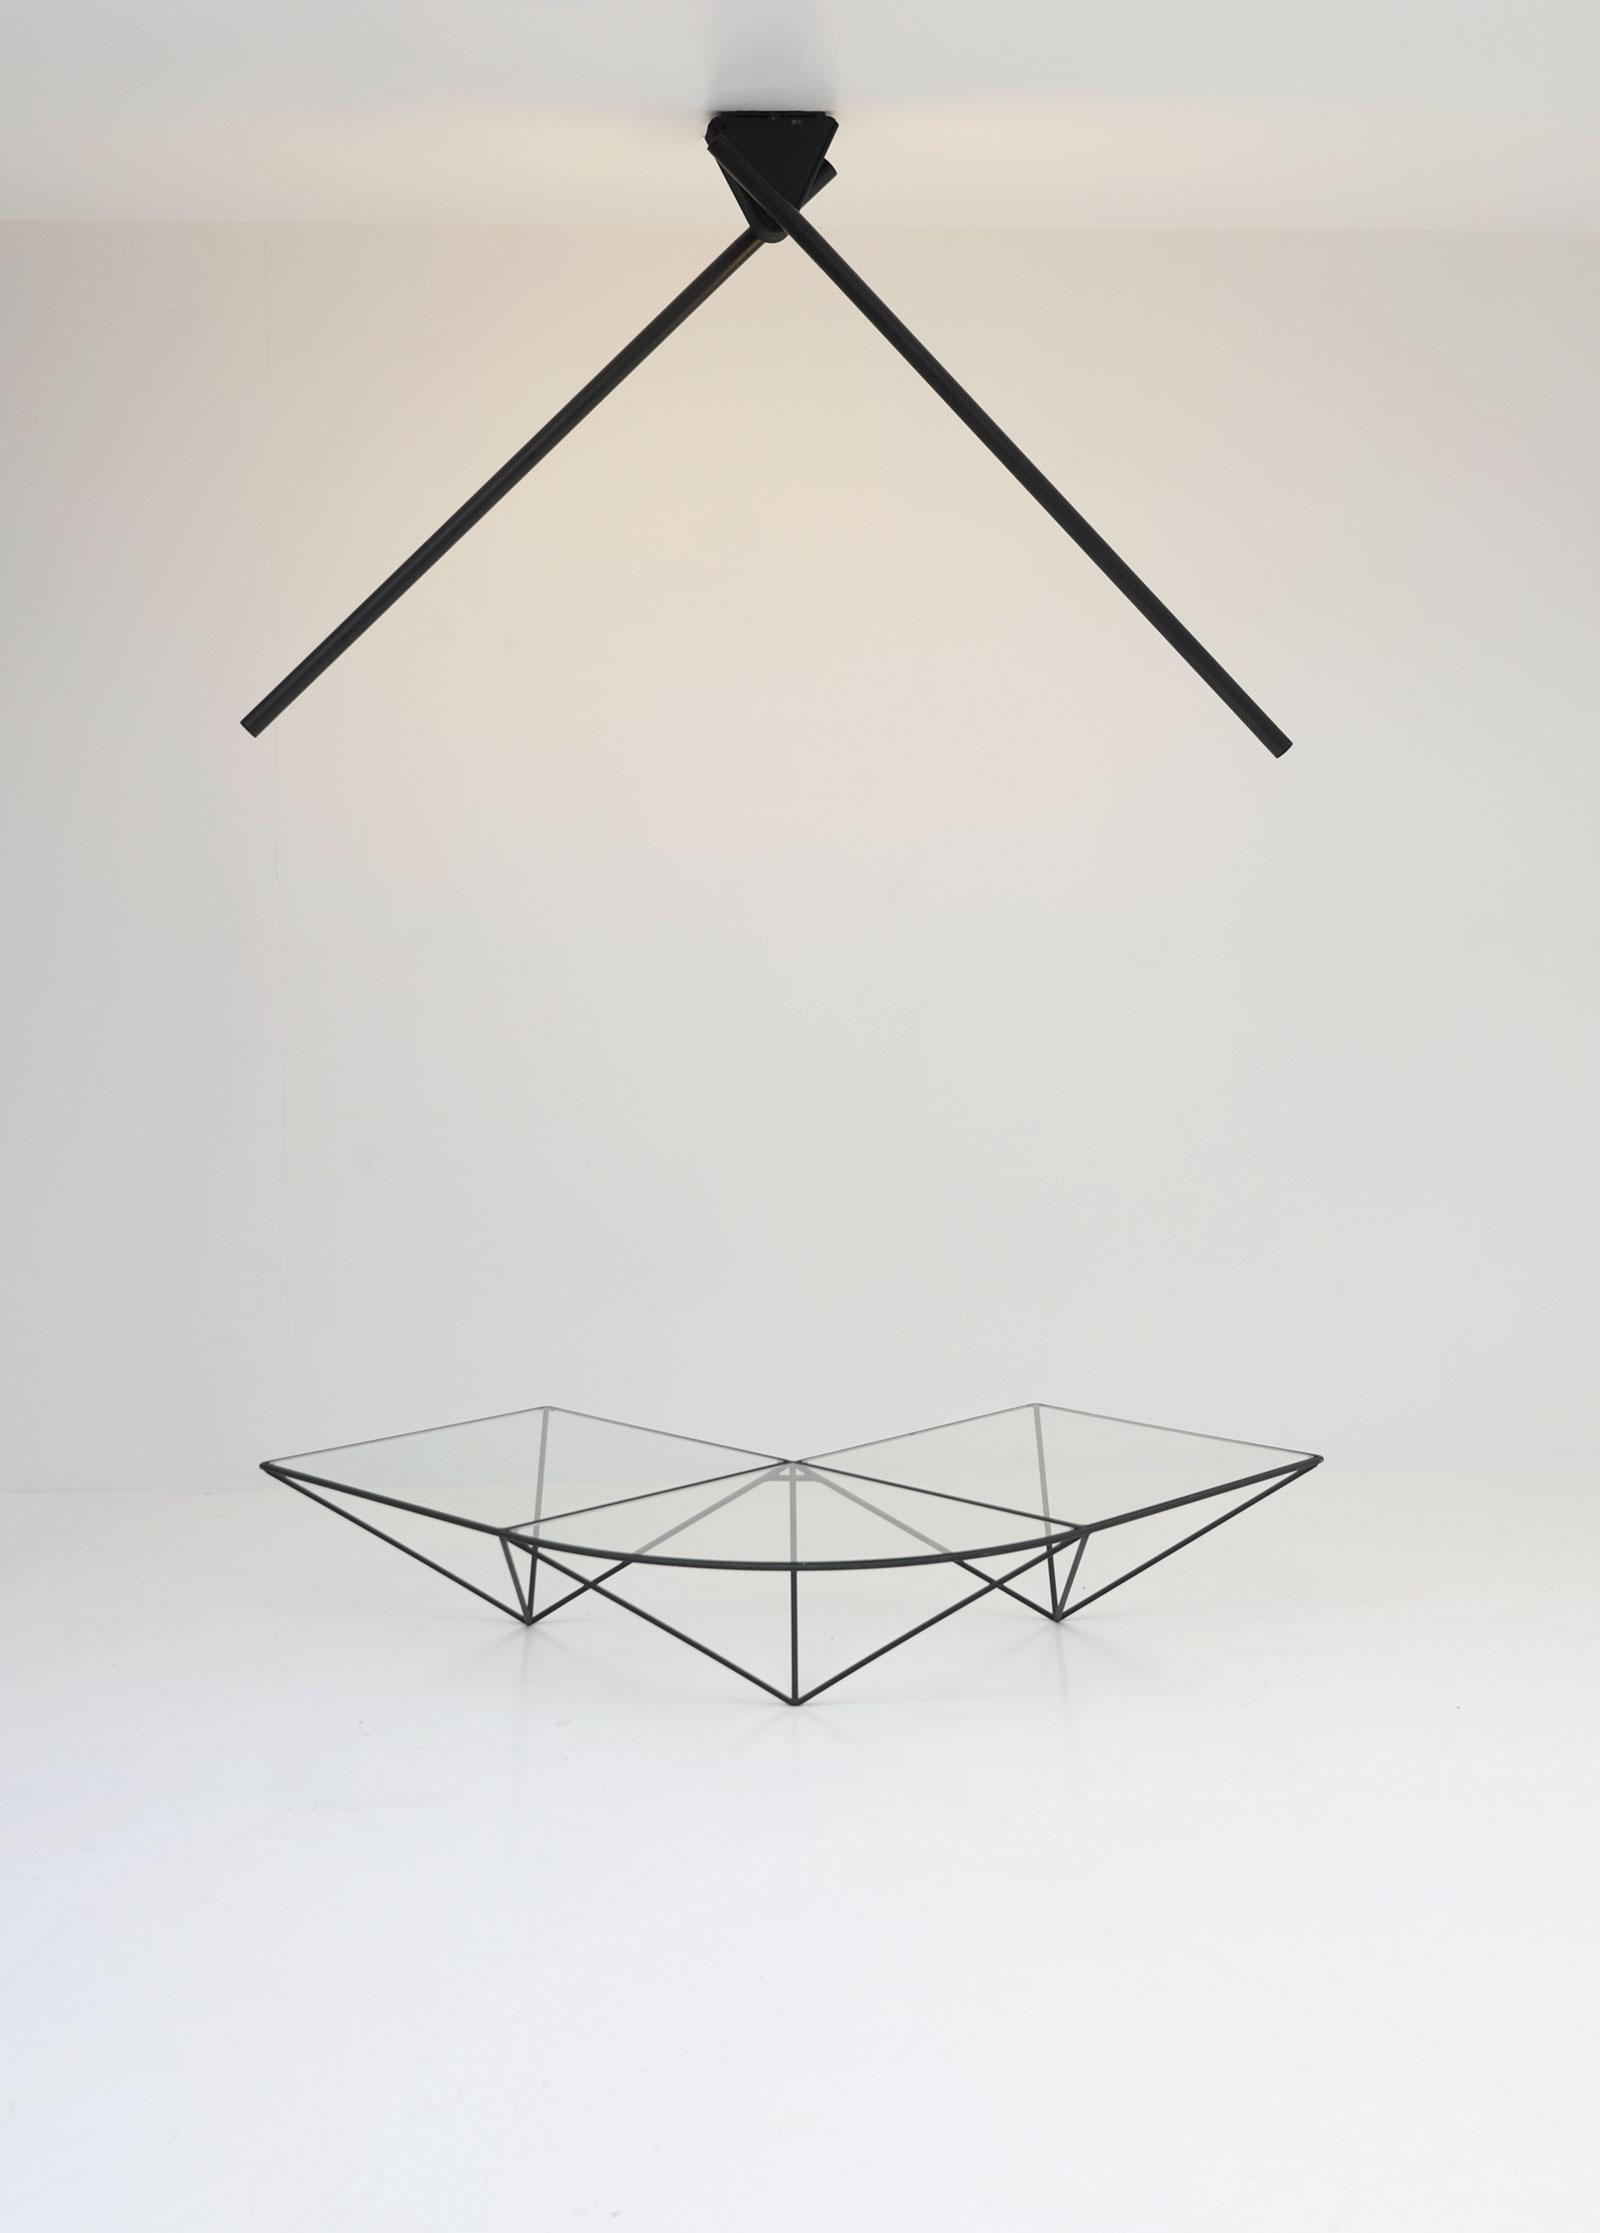 Rodolfo Bonetto Wall, Ceiling or Floor lampimage 13